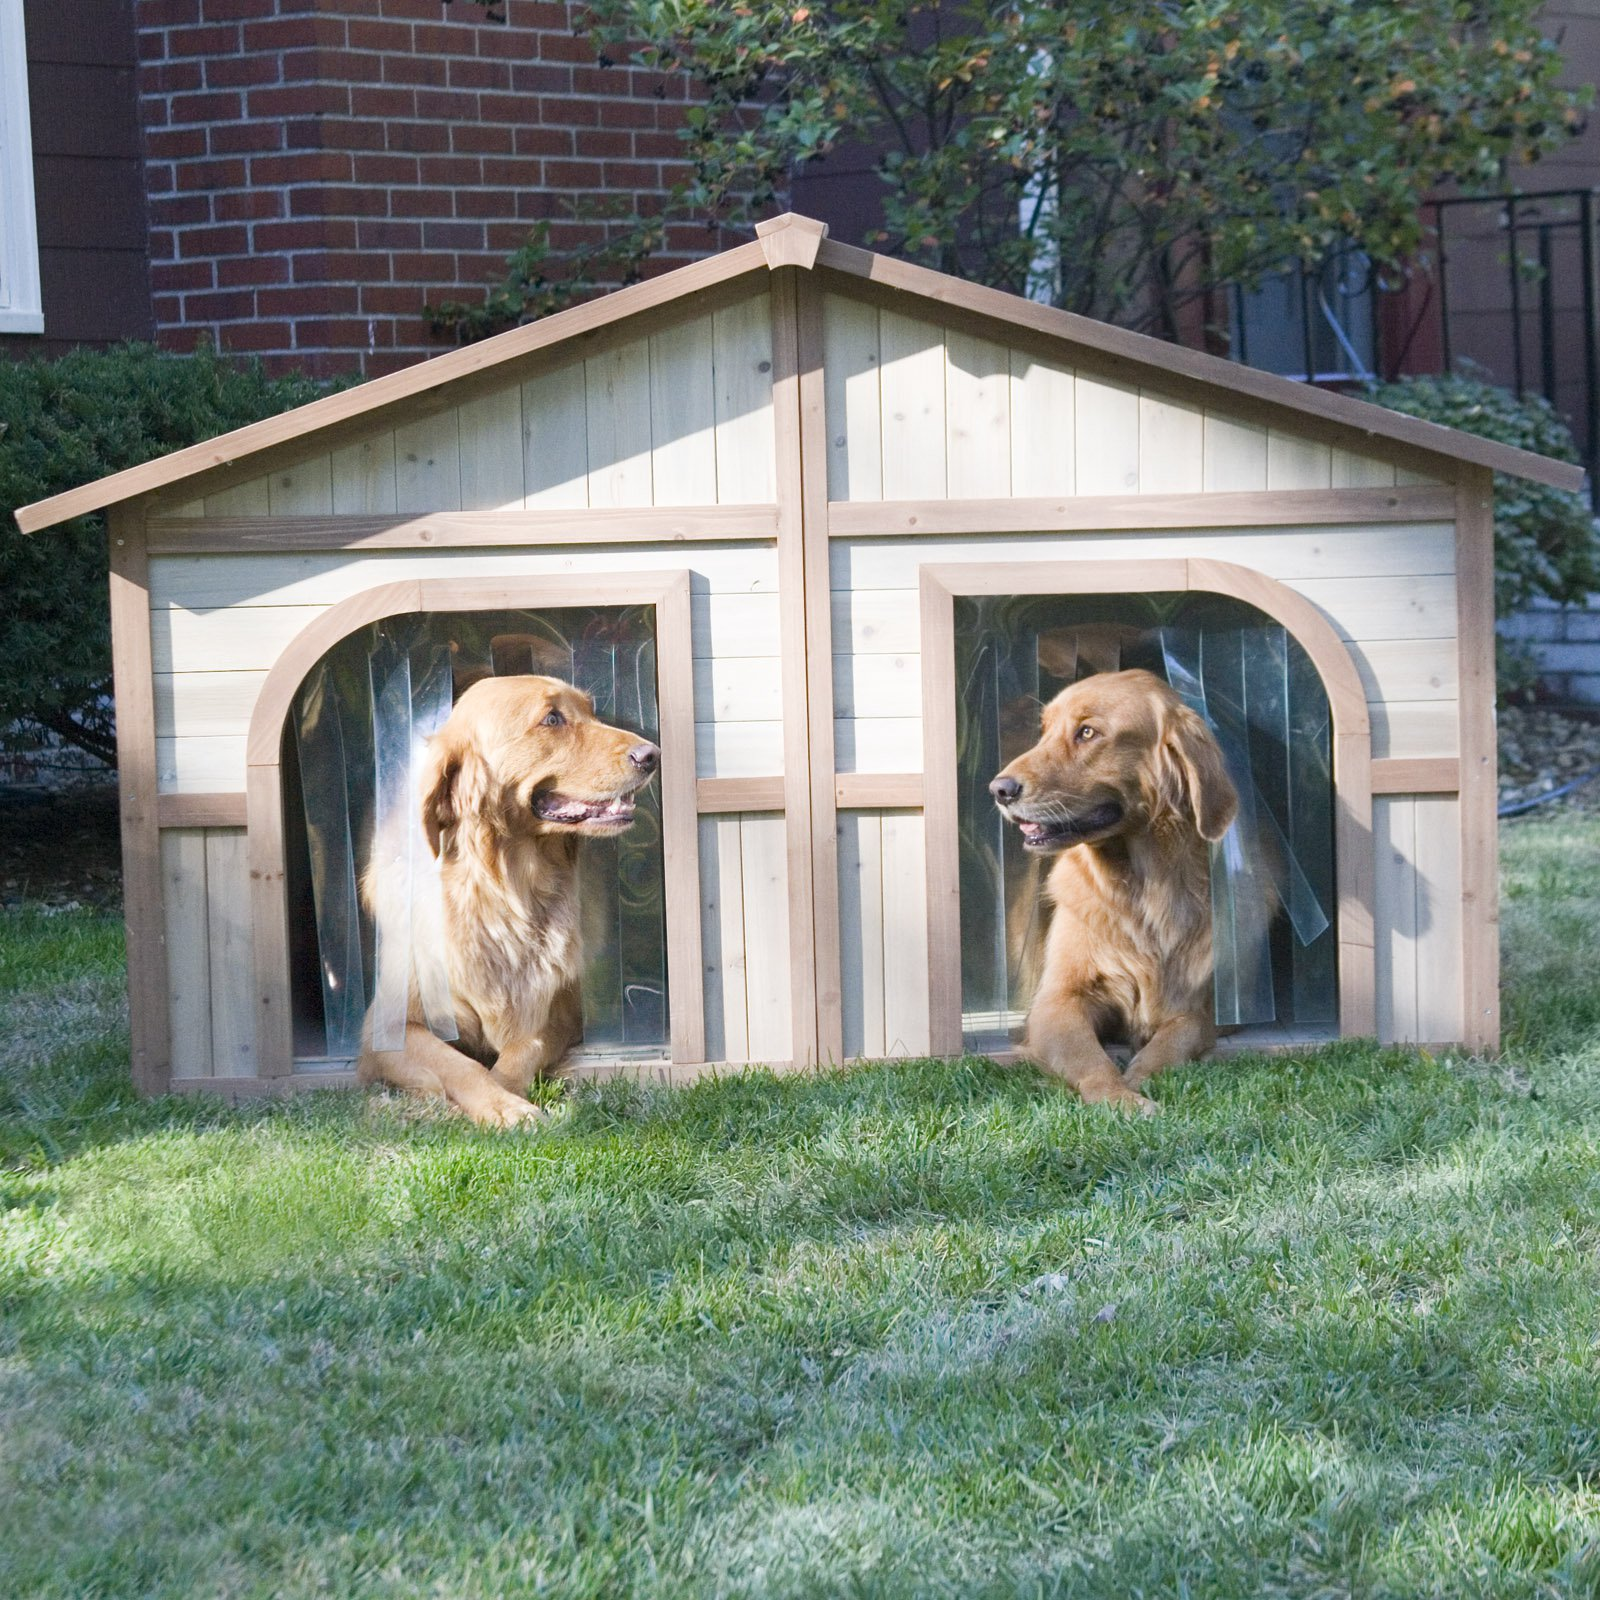 Boomer & George Wood Dog House with FREE Dog Doors